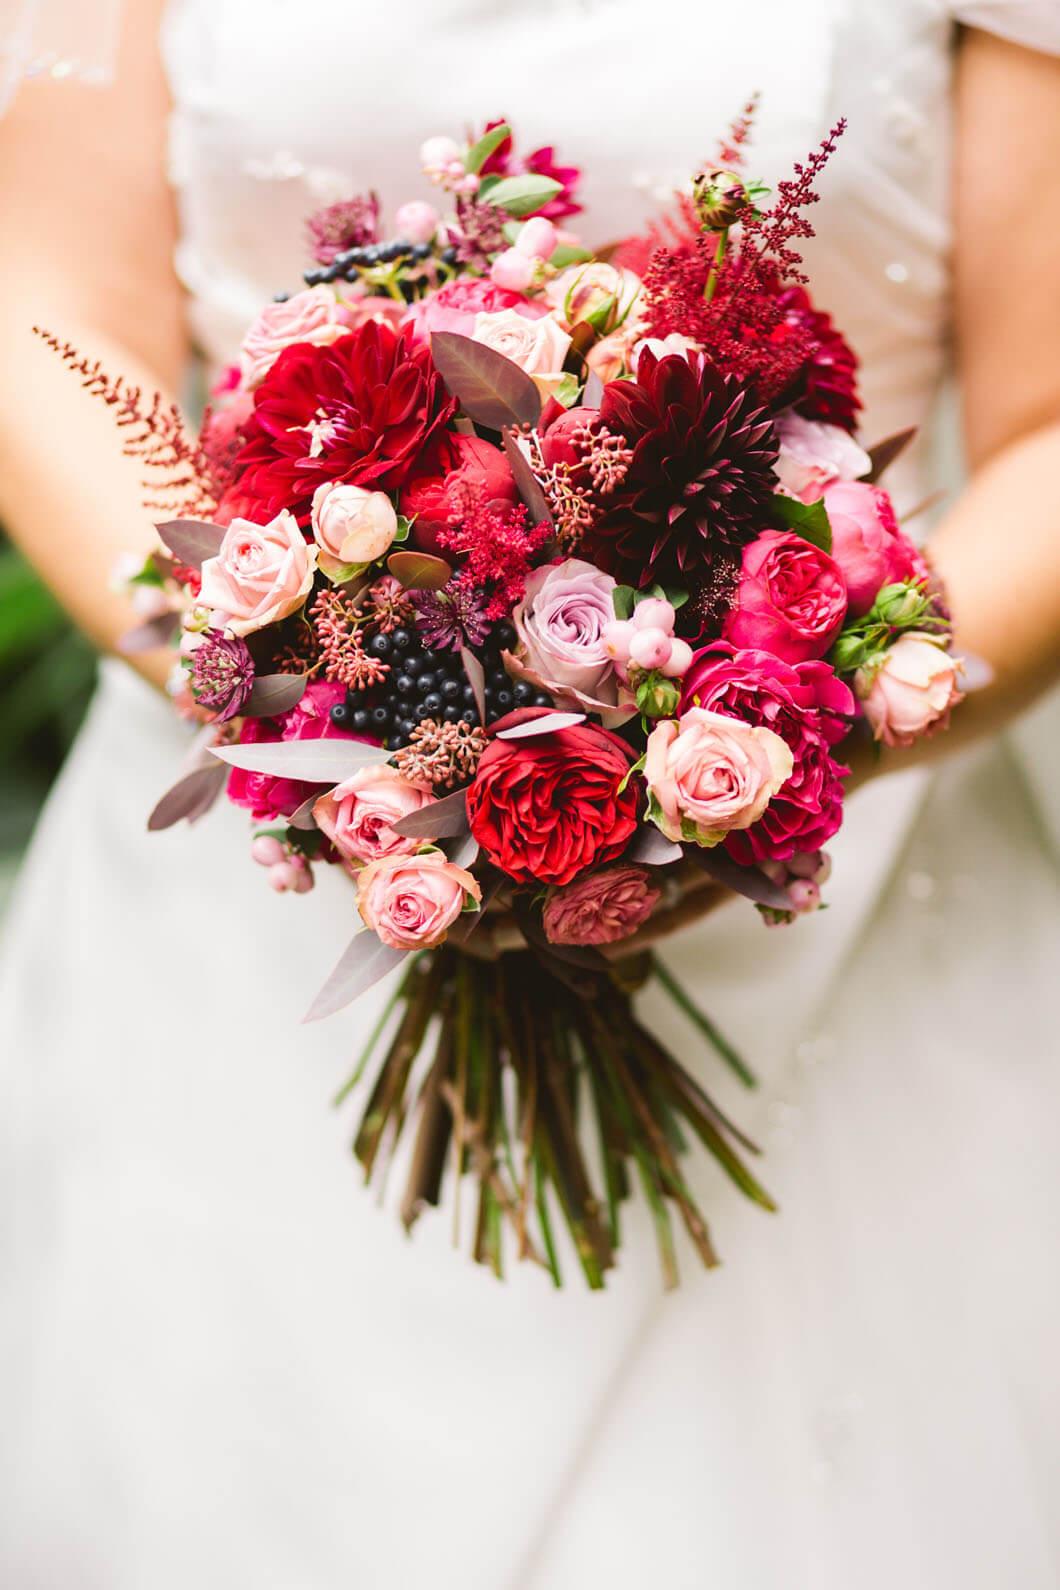 färgfull bröllopsbukett